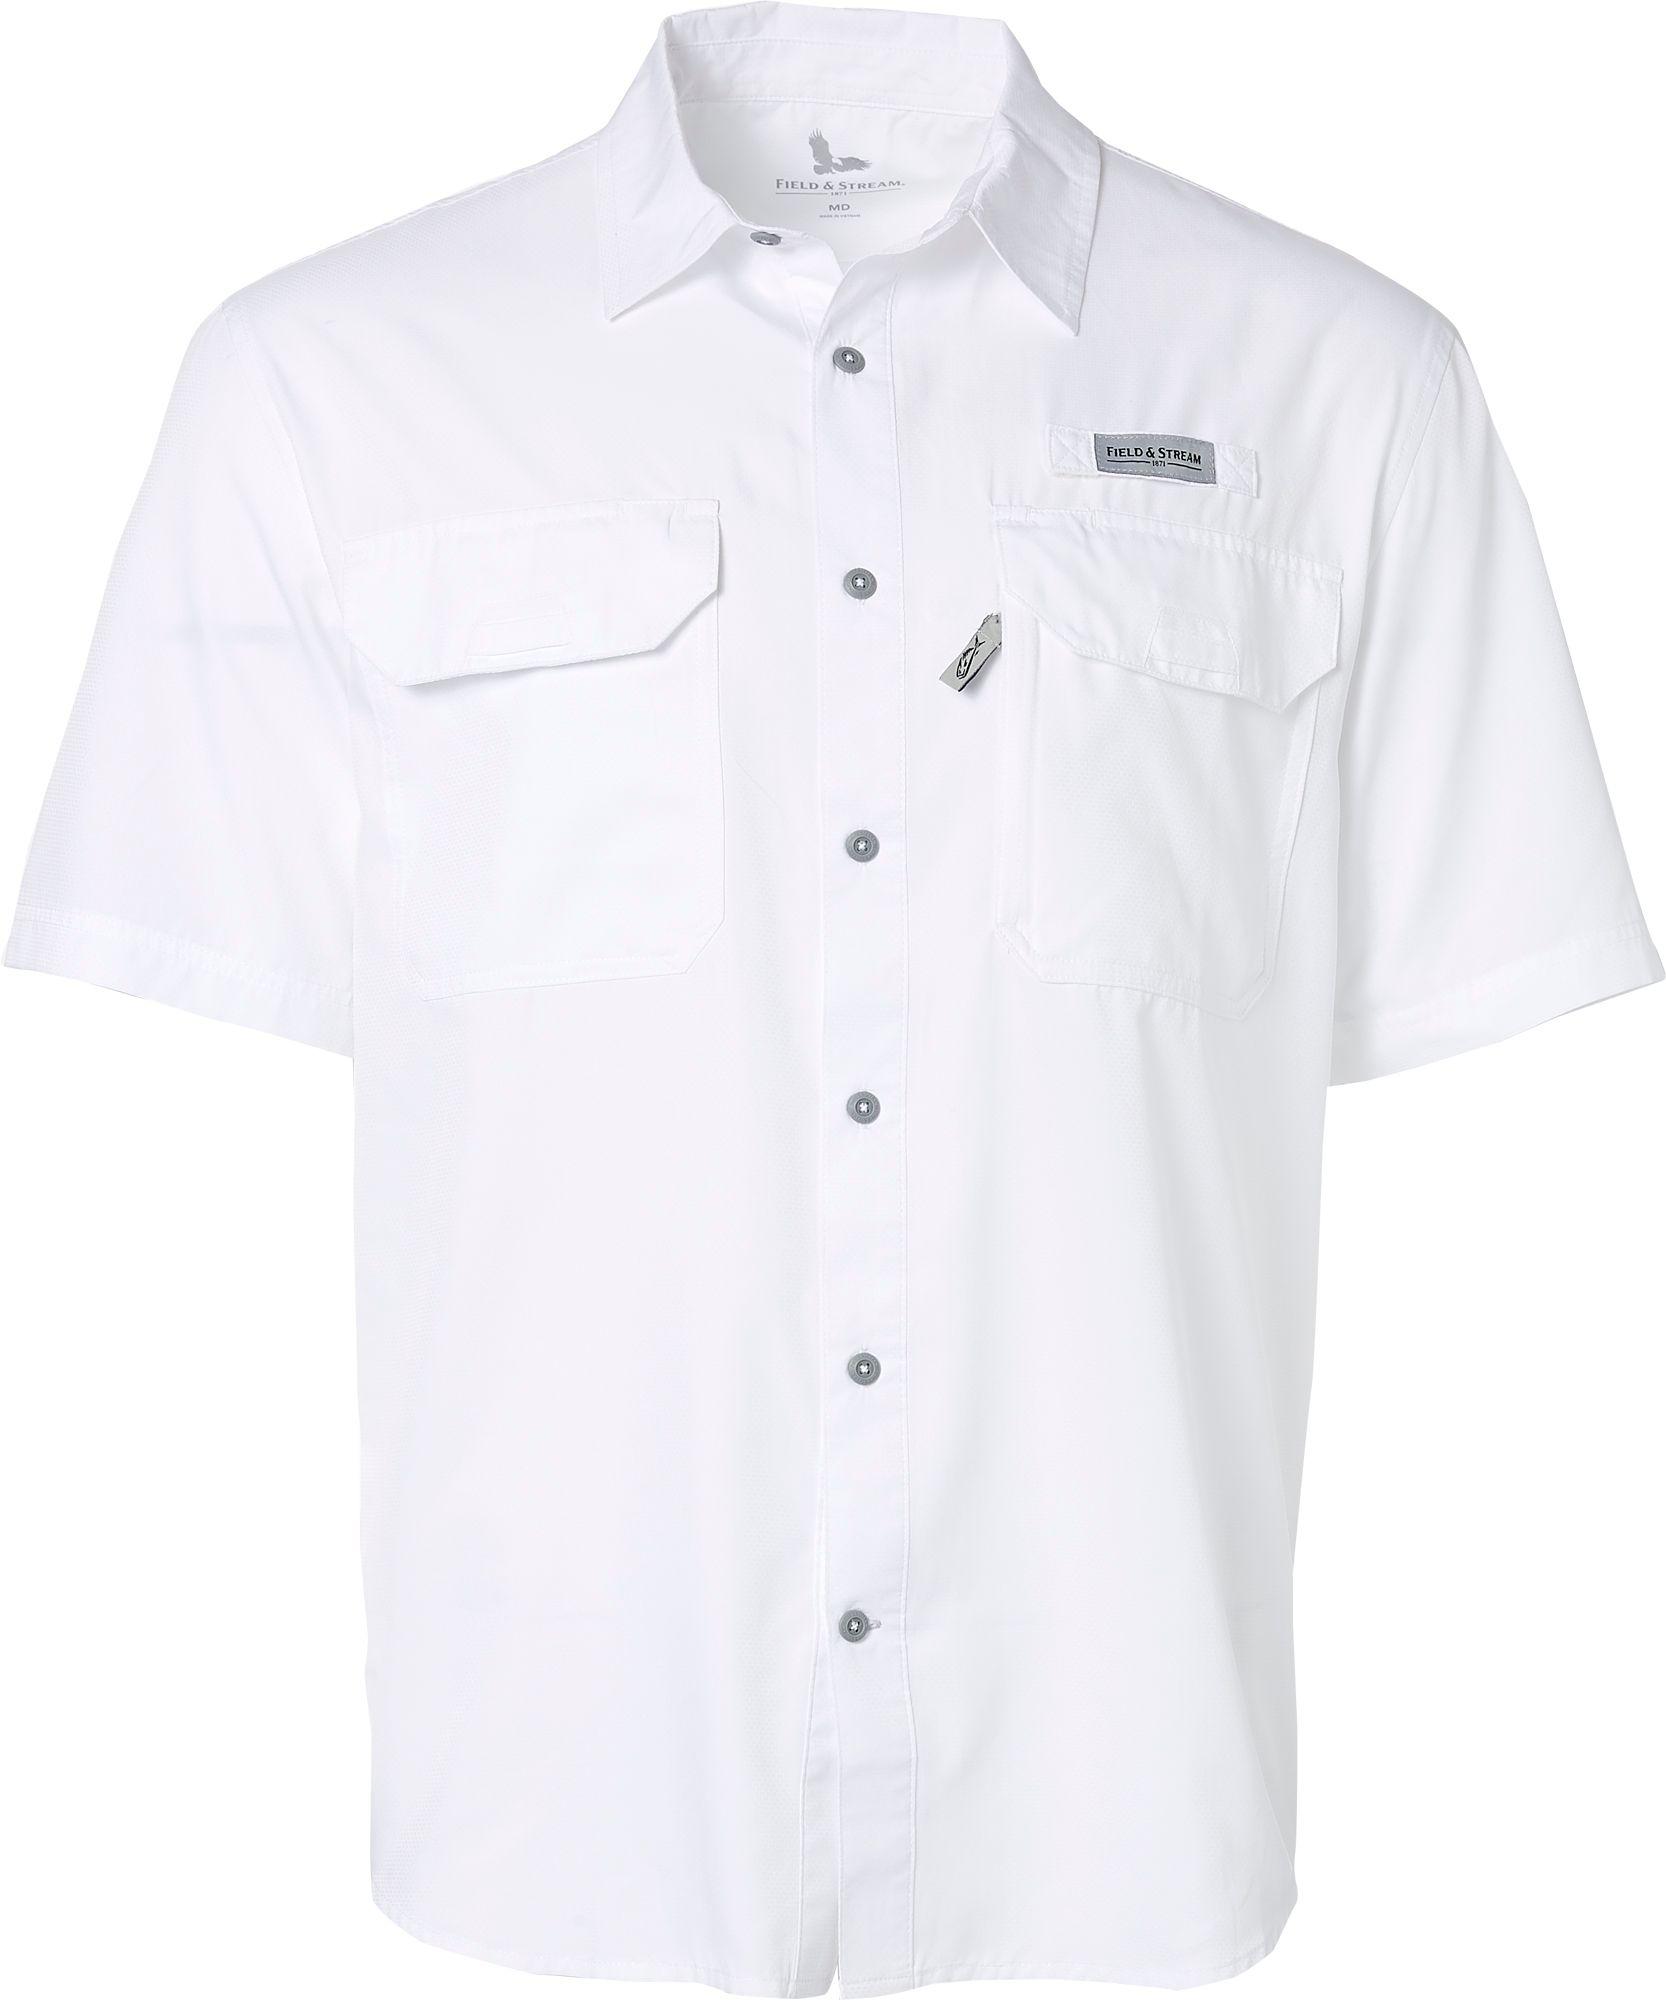 Field & Stream Men's 2017 Latitude Short Sleeve Shirt